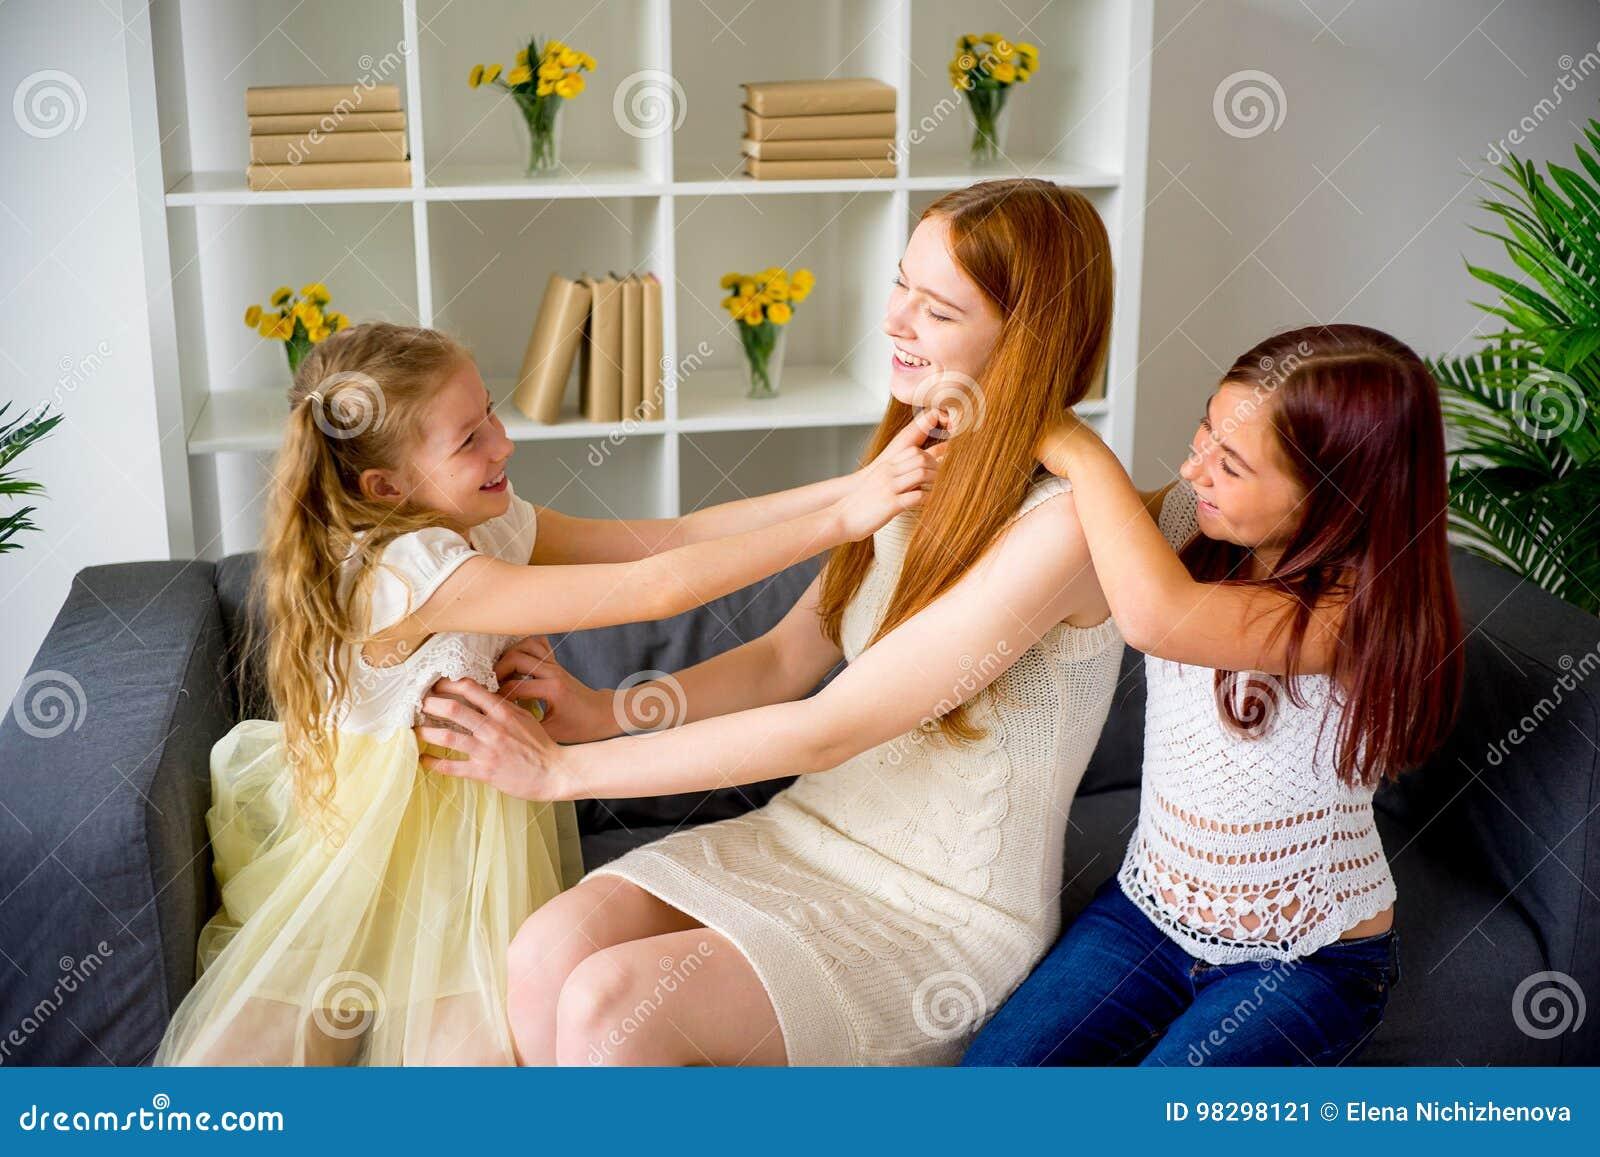 Tickling sexy moms, watchersweb blue best pussy